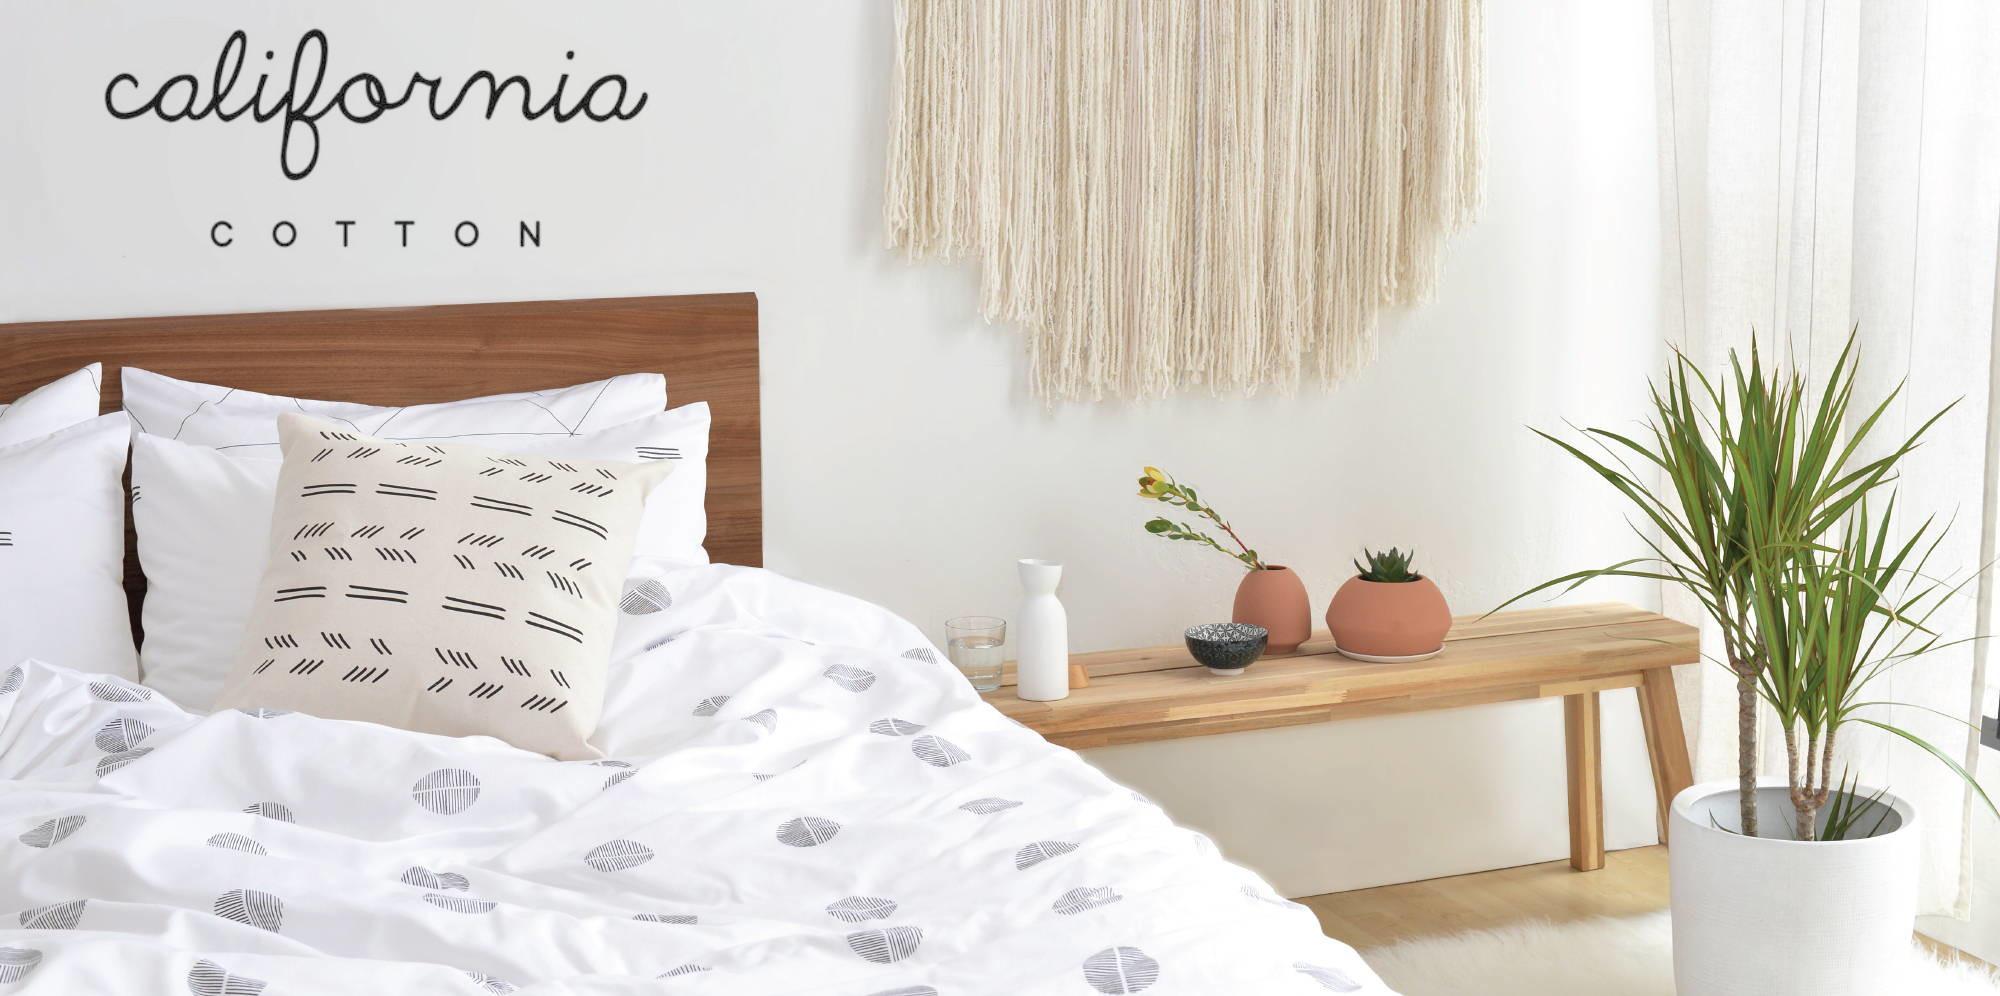 california cotton sateen sheets review